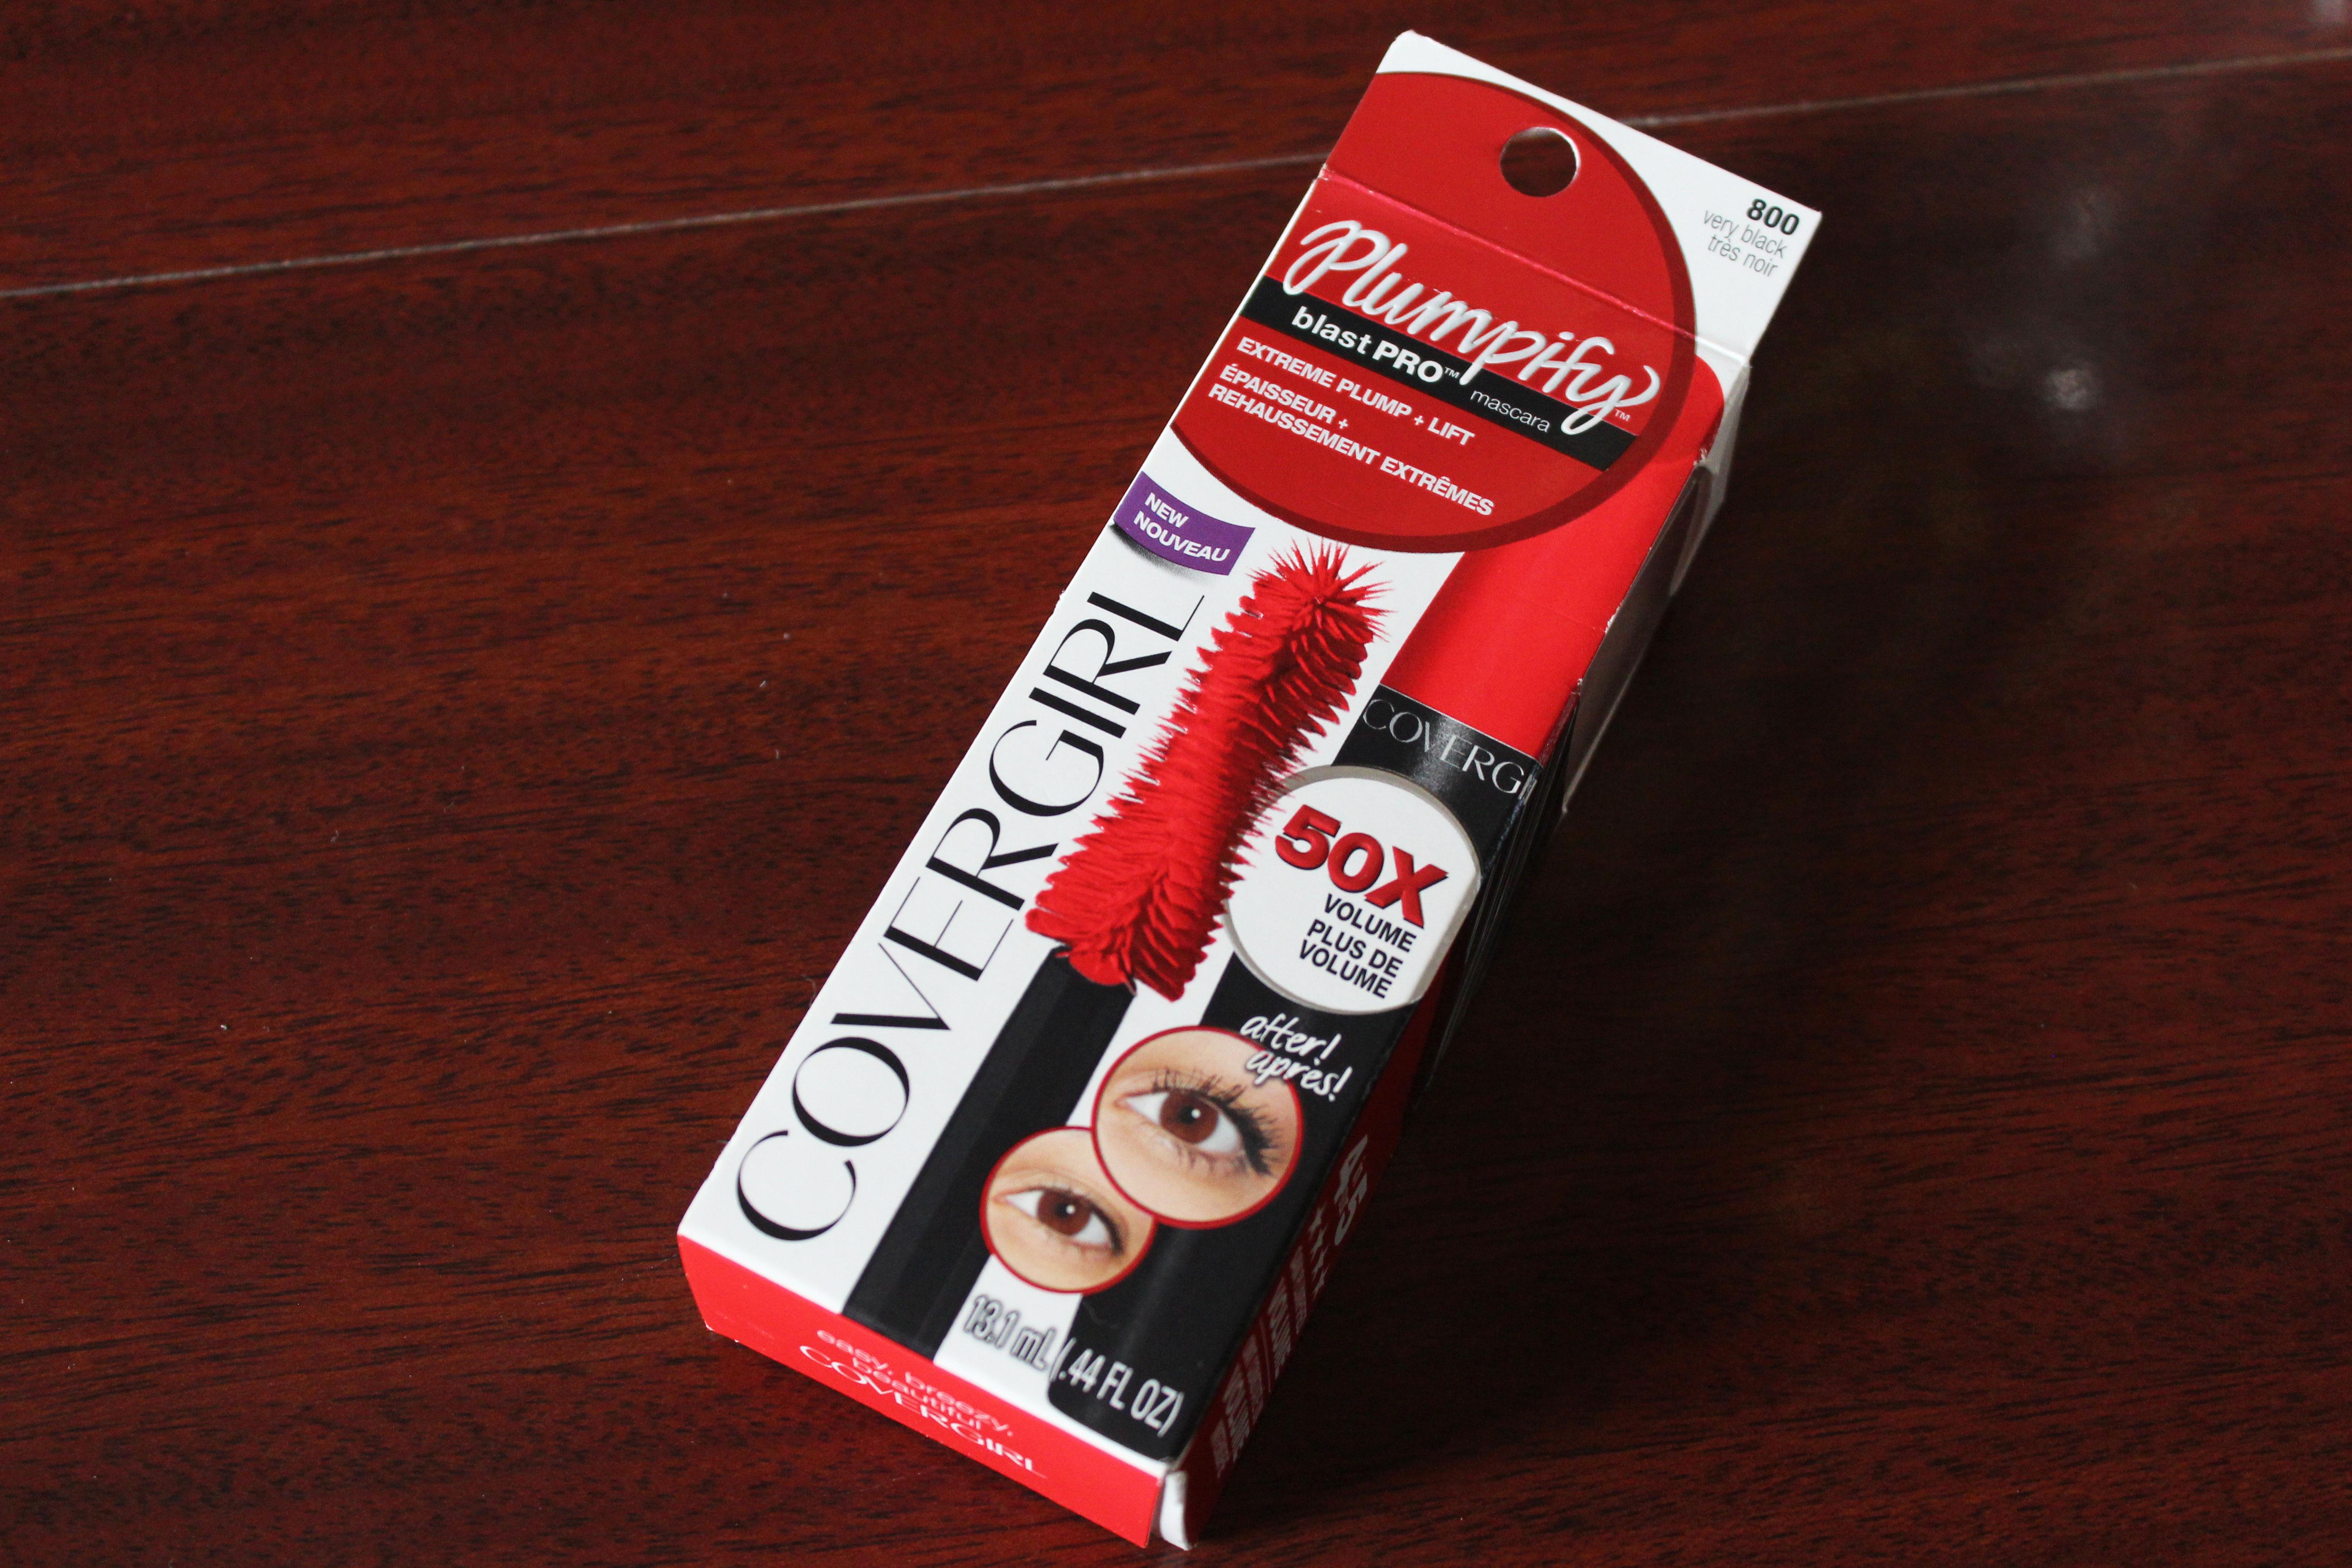 covergirl plumpify blast pro mascara